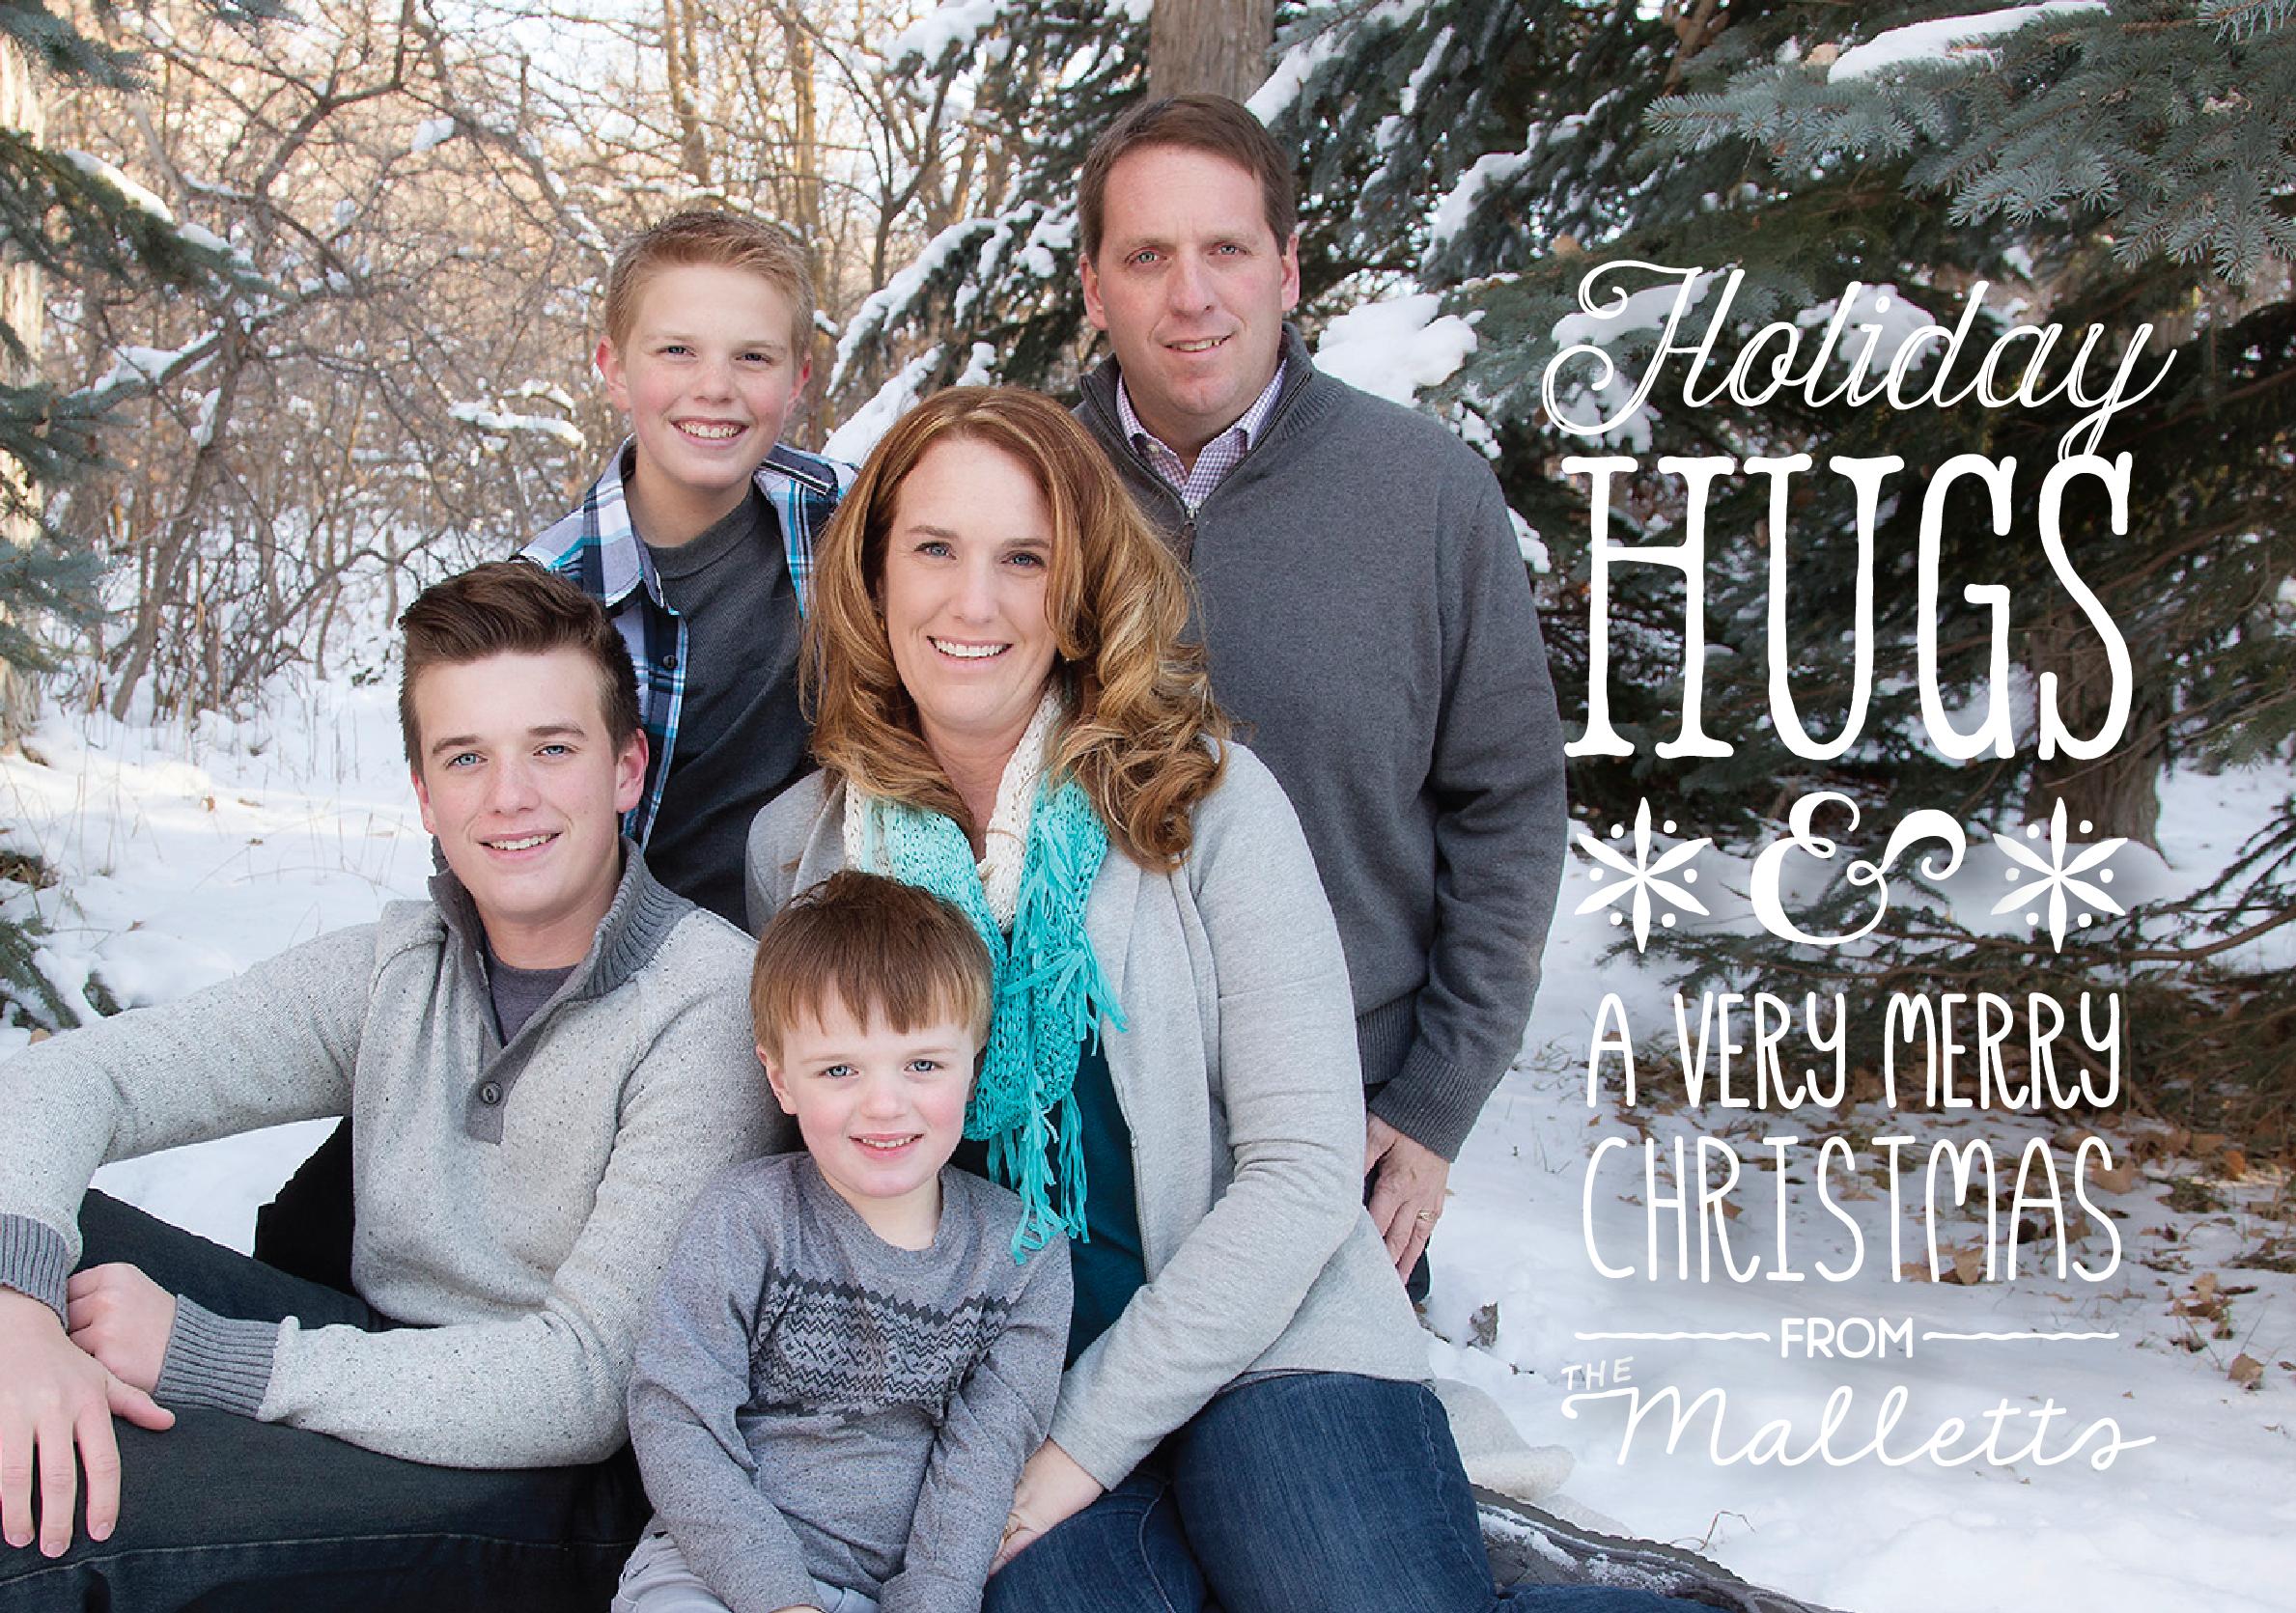 Mallett 2015 Christmas Card front